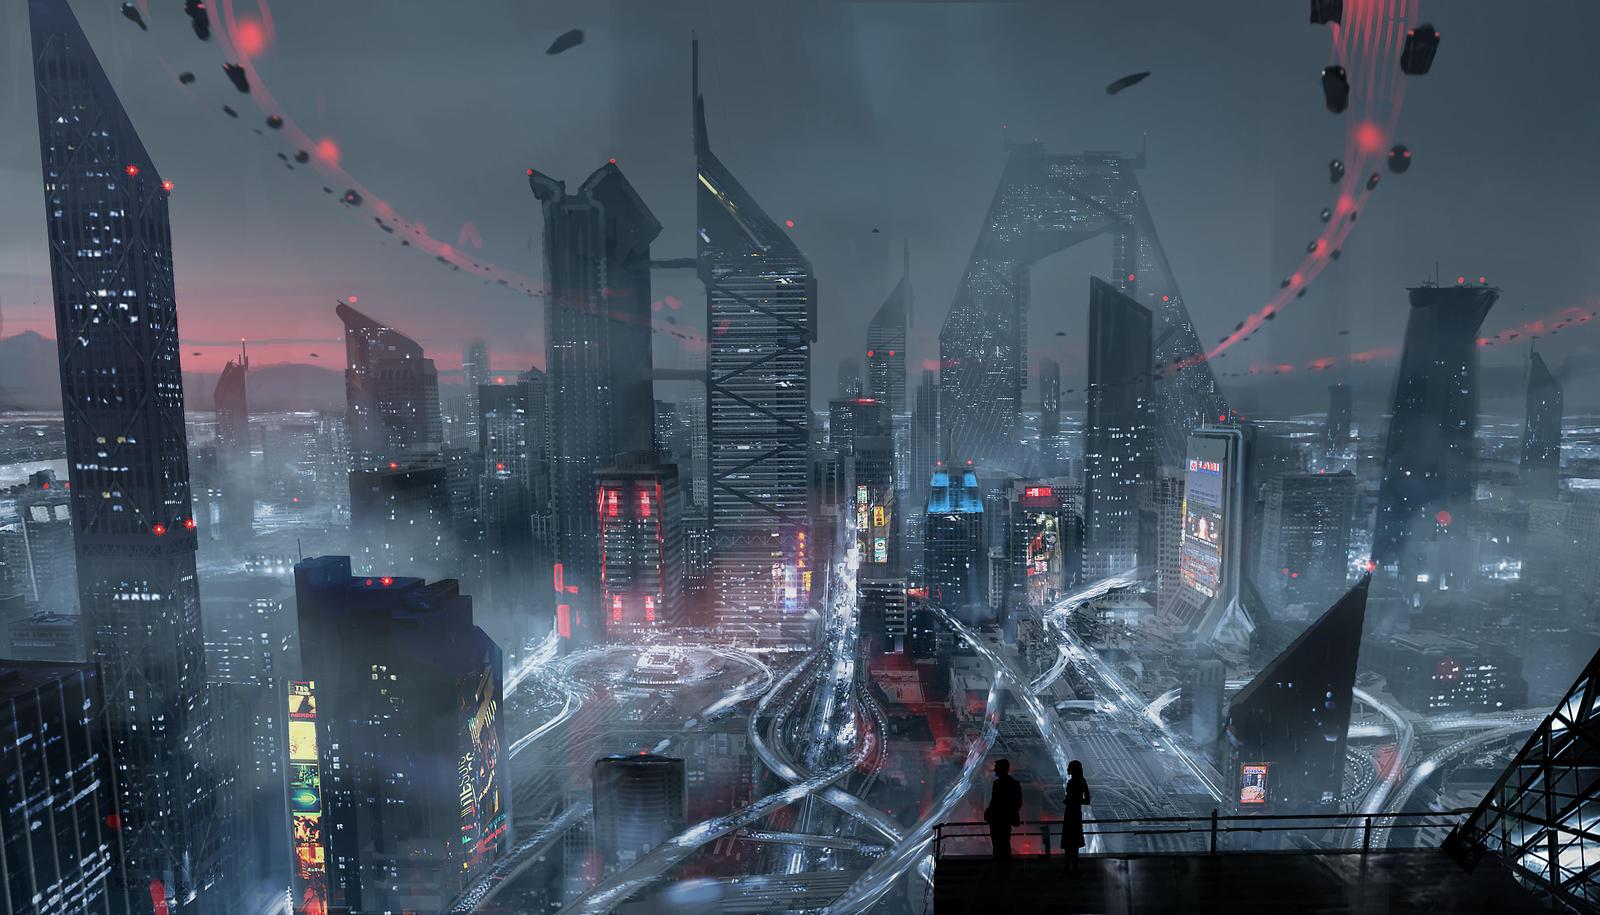 Artwork <b>Digital Art City</b>